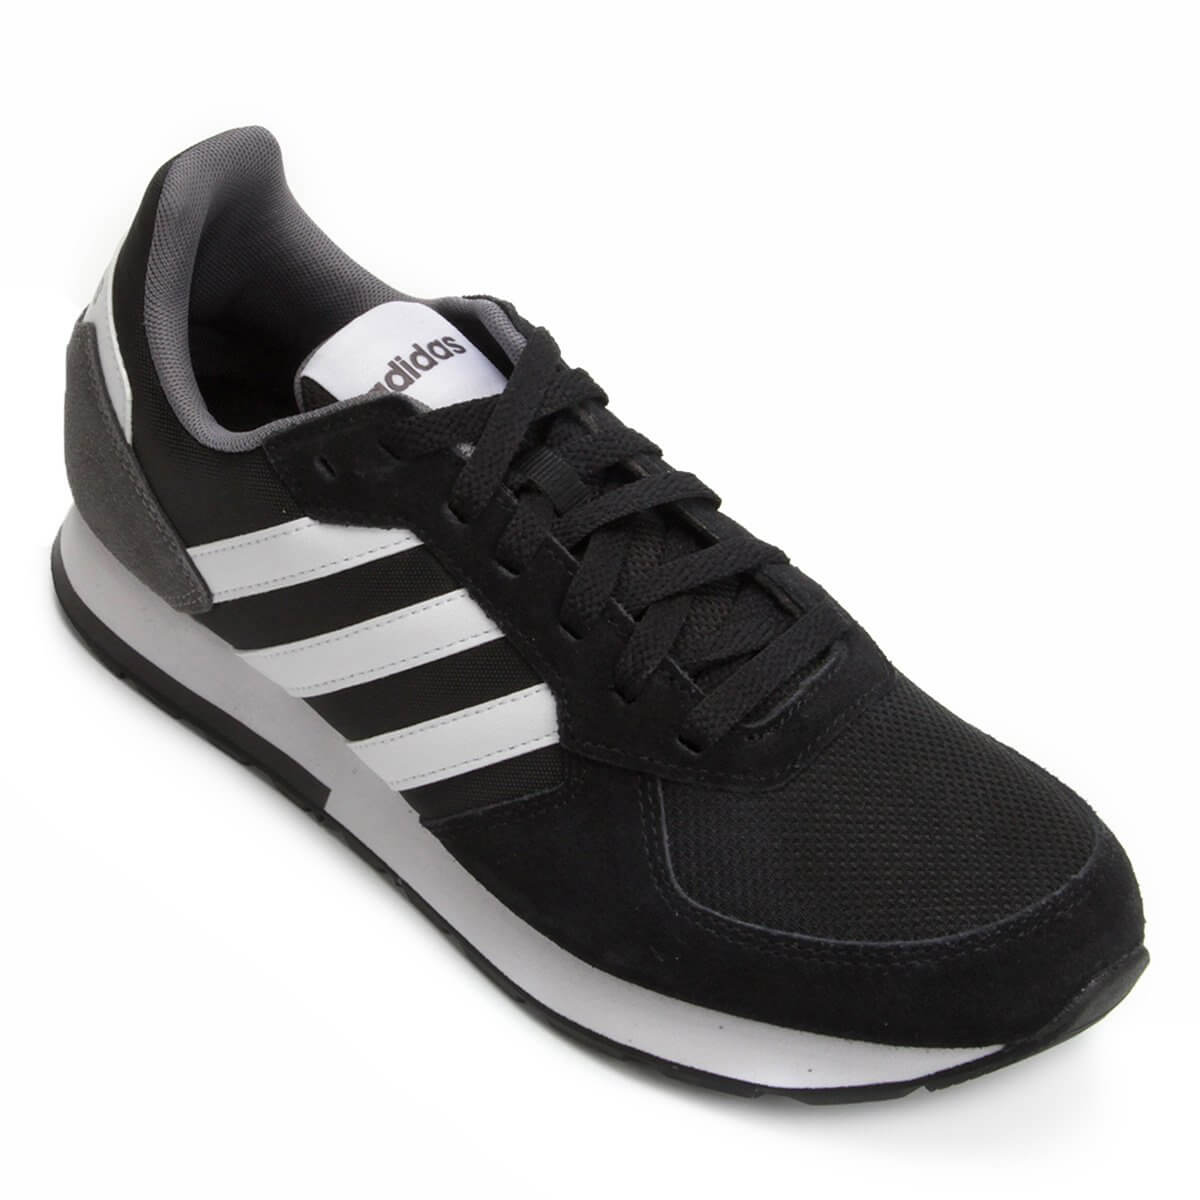 9599b0f83bc56 Tênis Adidas 8K Masculino - Decker Online!